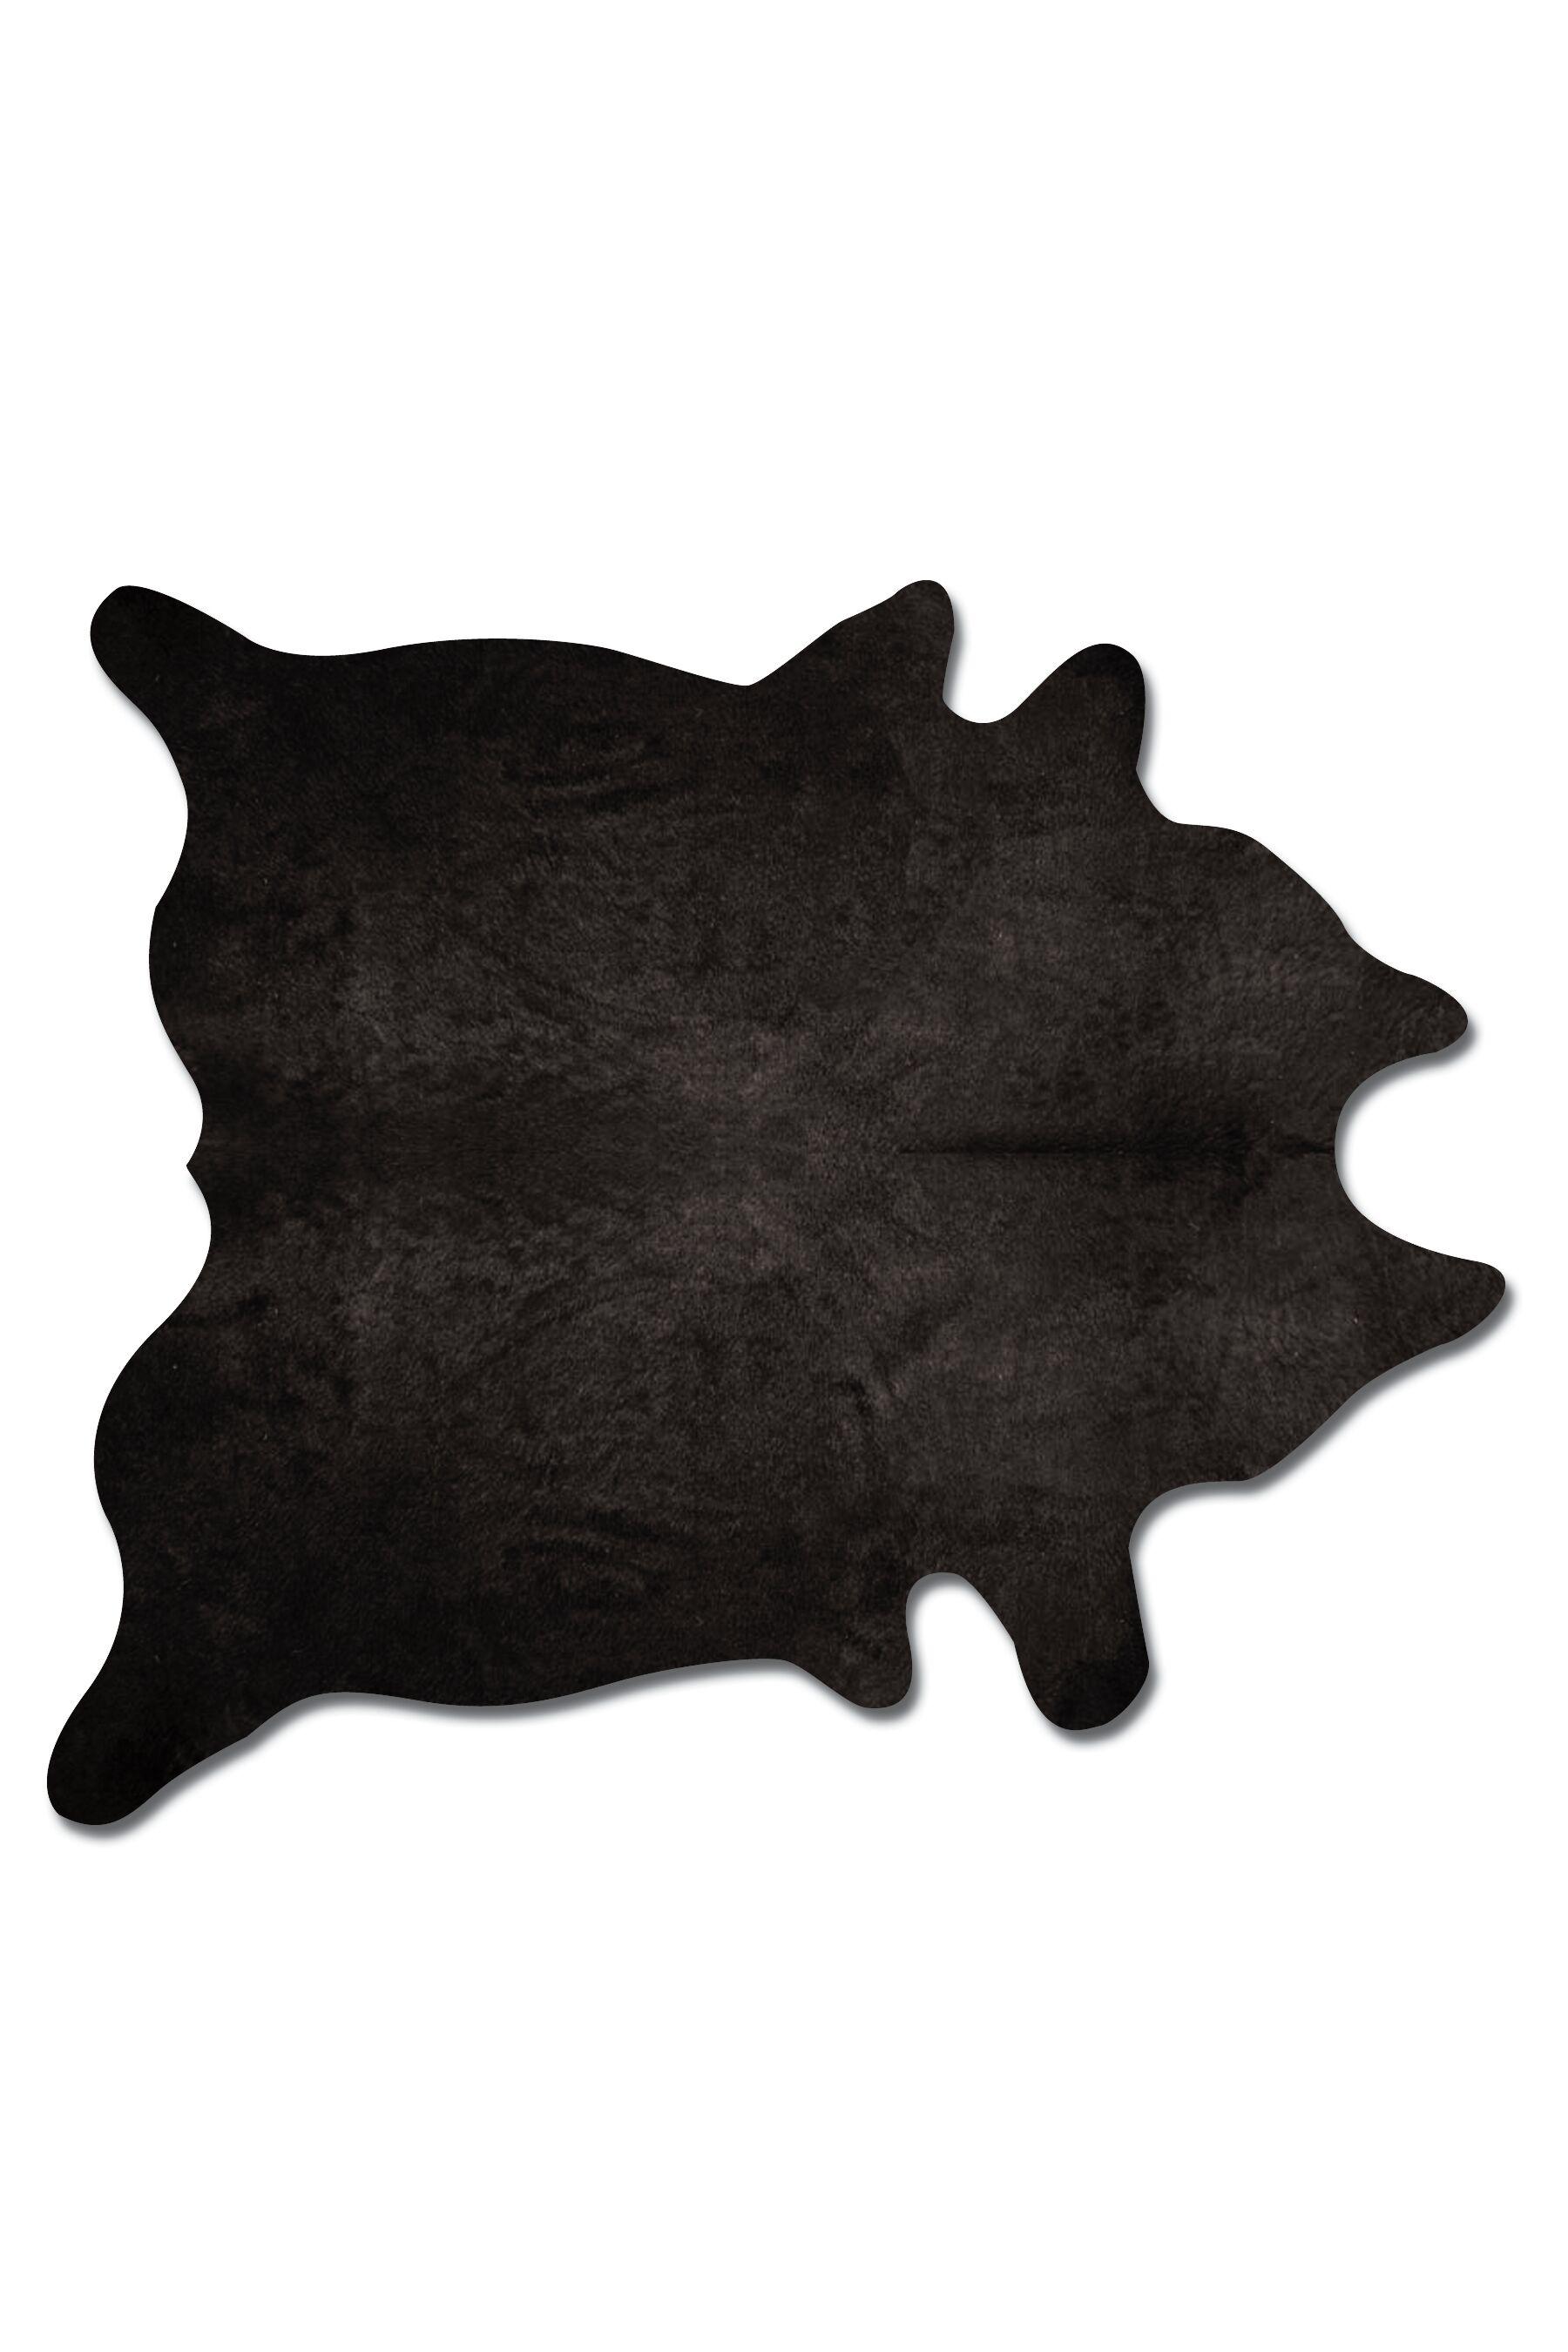 Plainsboro Handmade Black Cowhide Area Rug